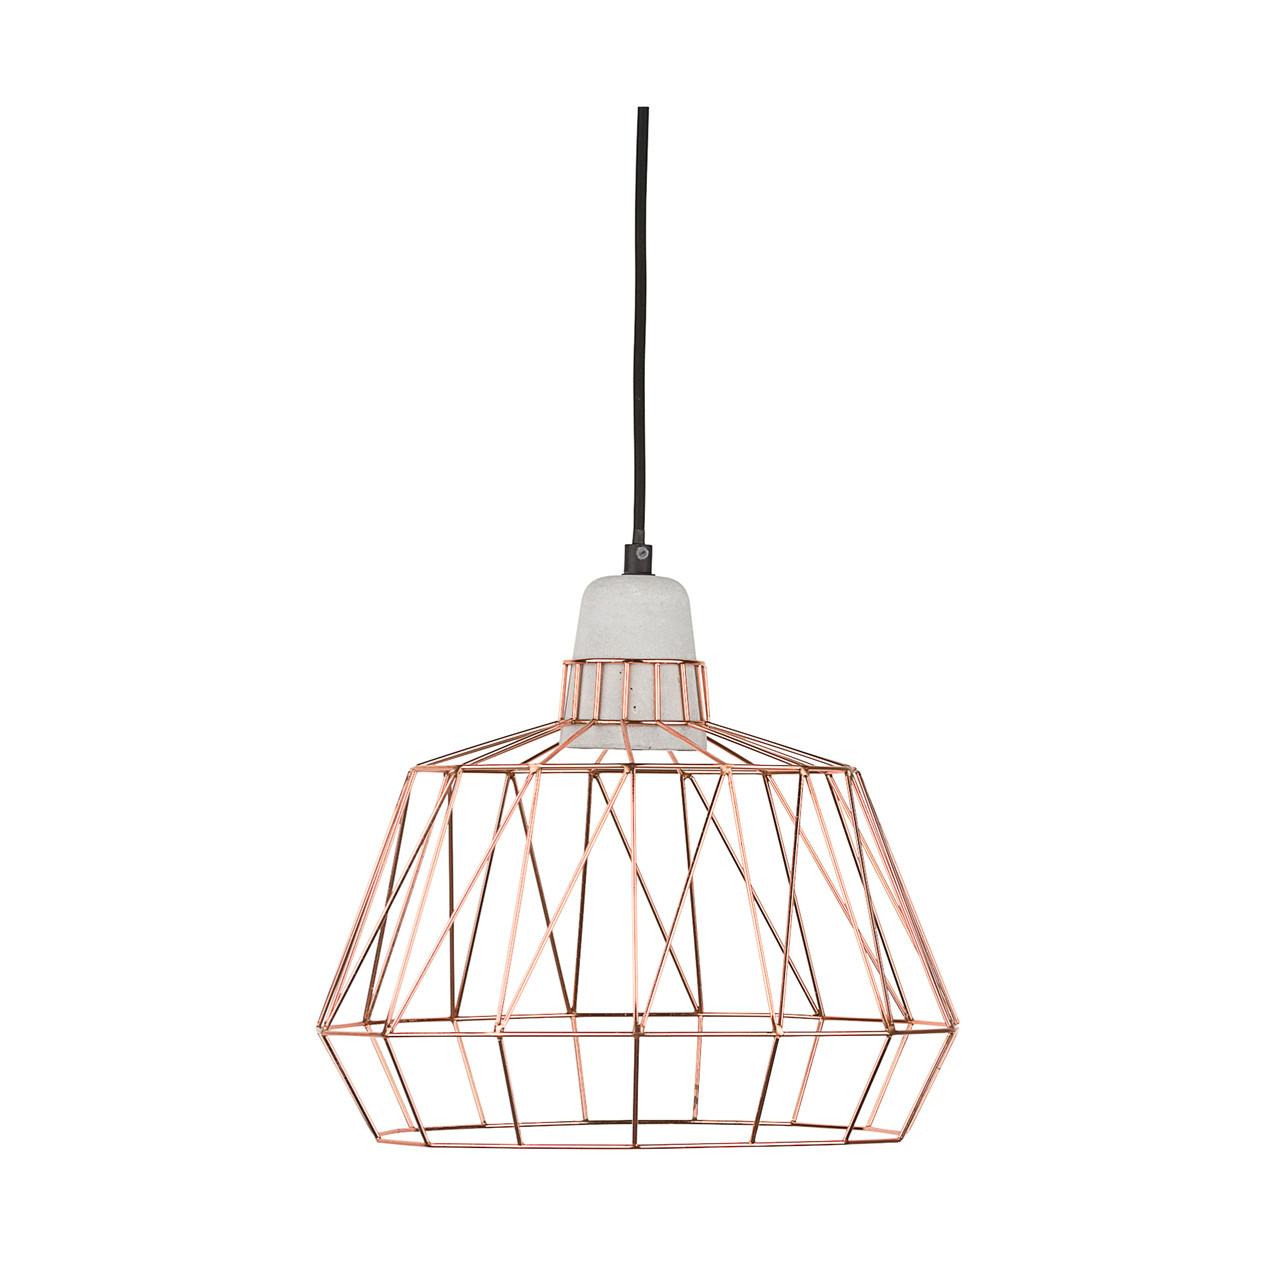 Cr ton maison elton loftlampe for Creton maison